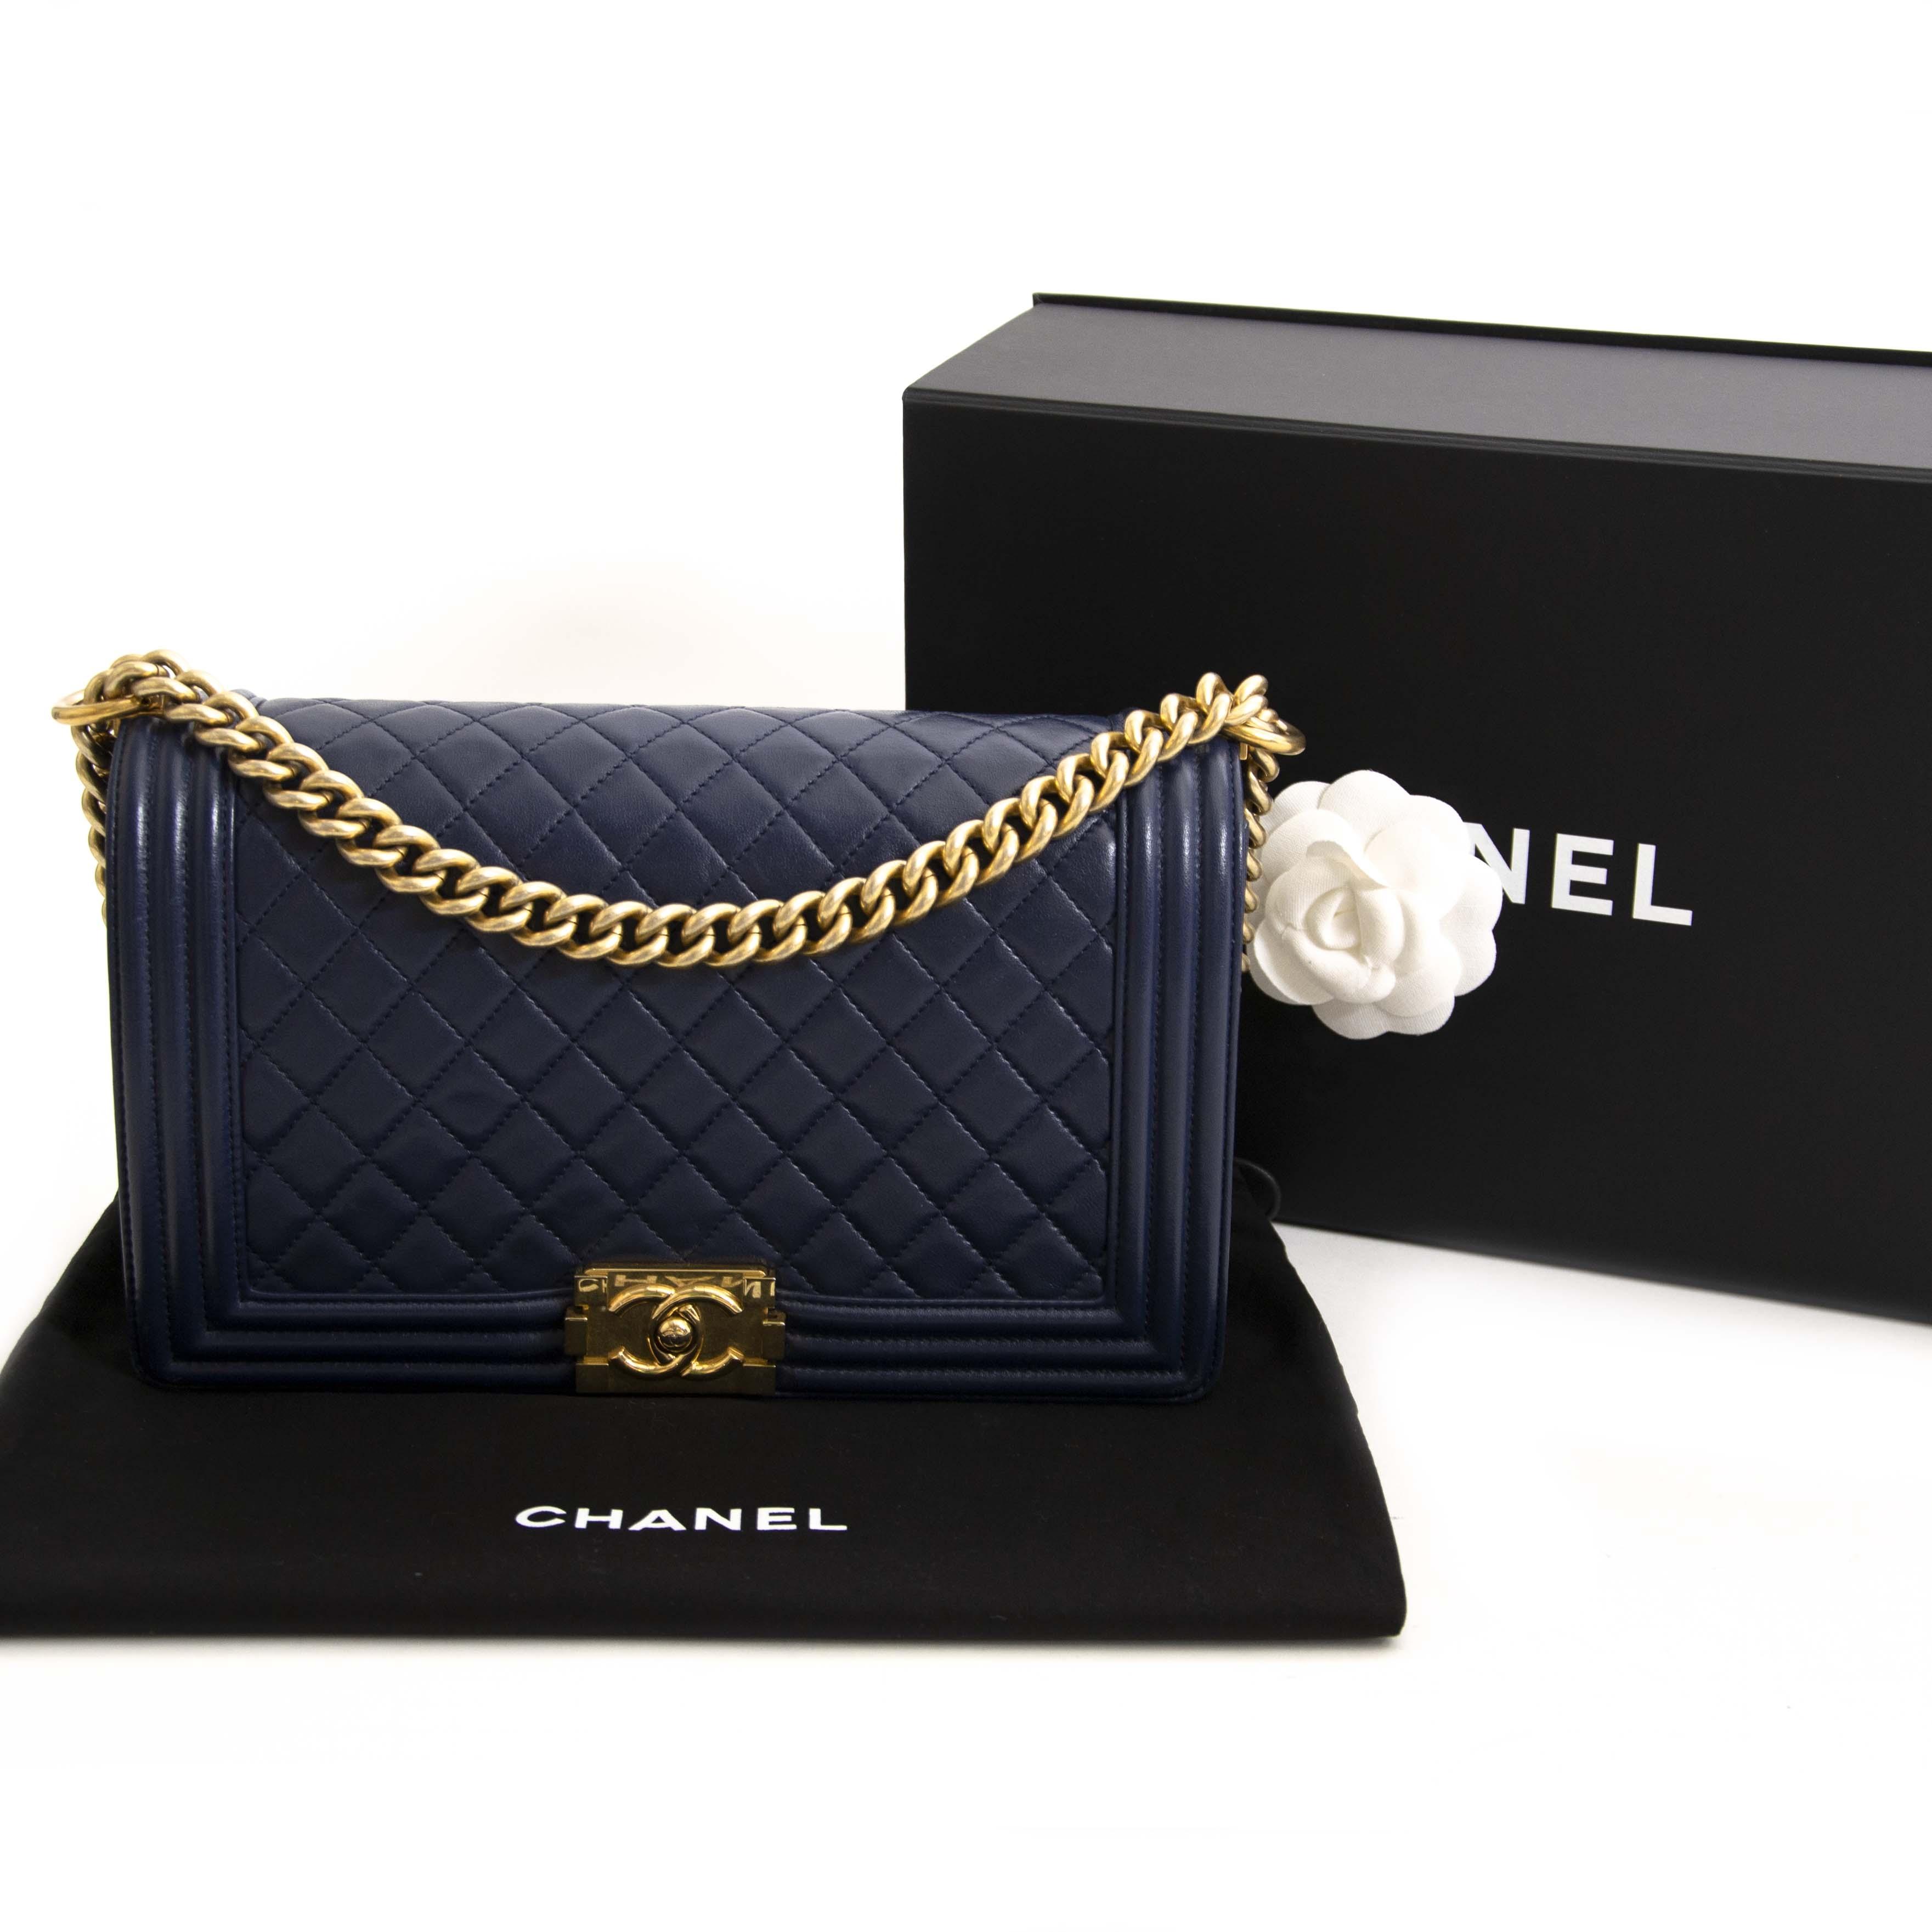 c972d4c23fac ... 100% worldwide shipping authentic luxury Chanel Blue Lambskin New  Medium Boy Bag